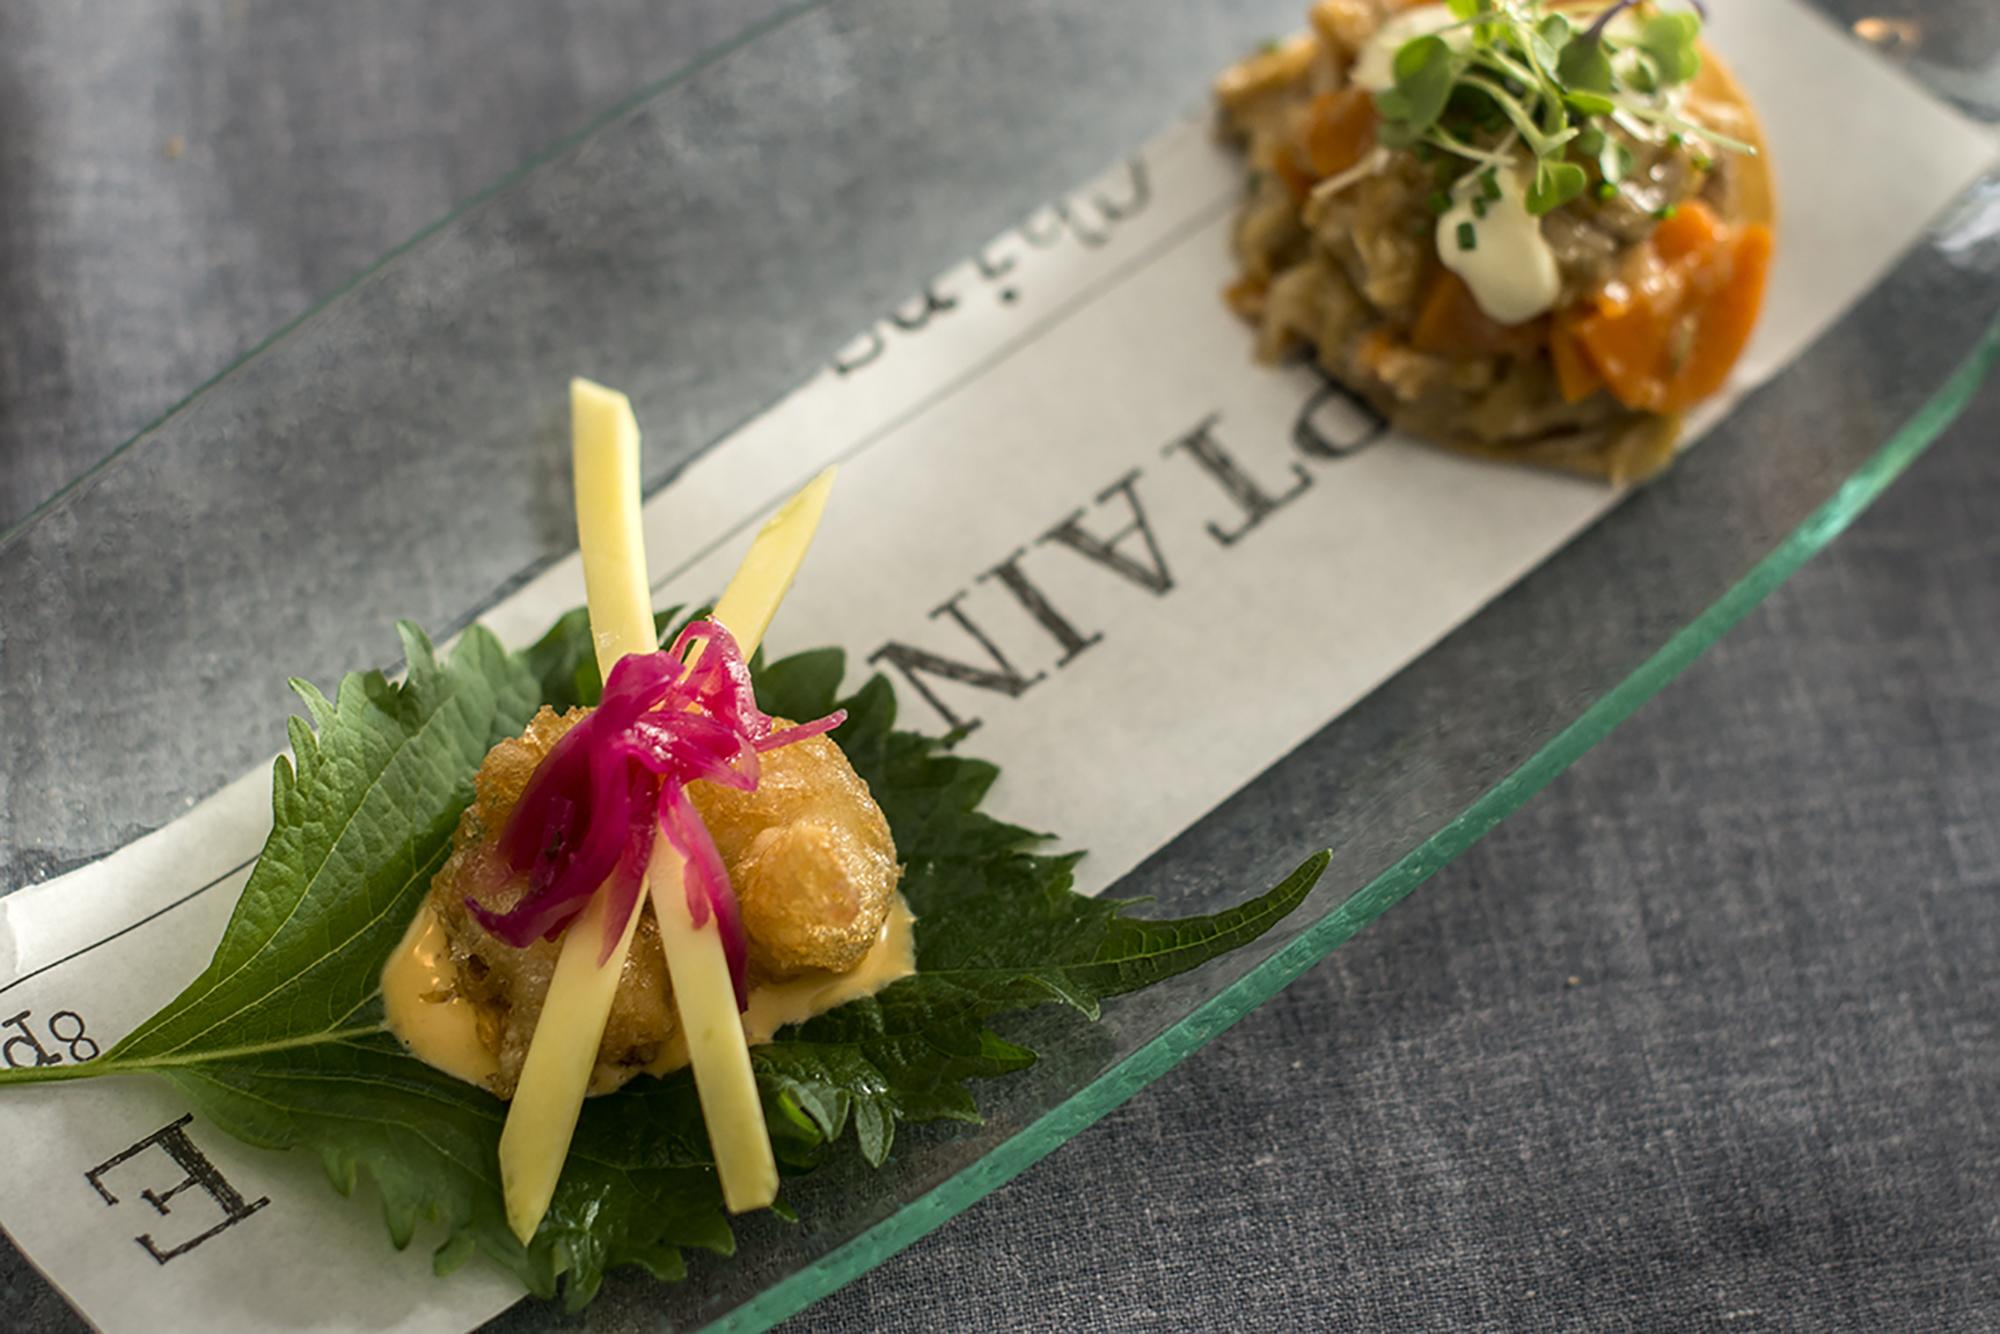 Gambón en tempura en hoja de 'shiso' y tosta de escabeche de gallina con emulsión de jalapeños.